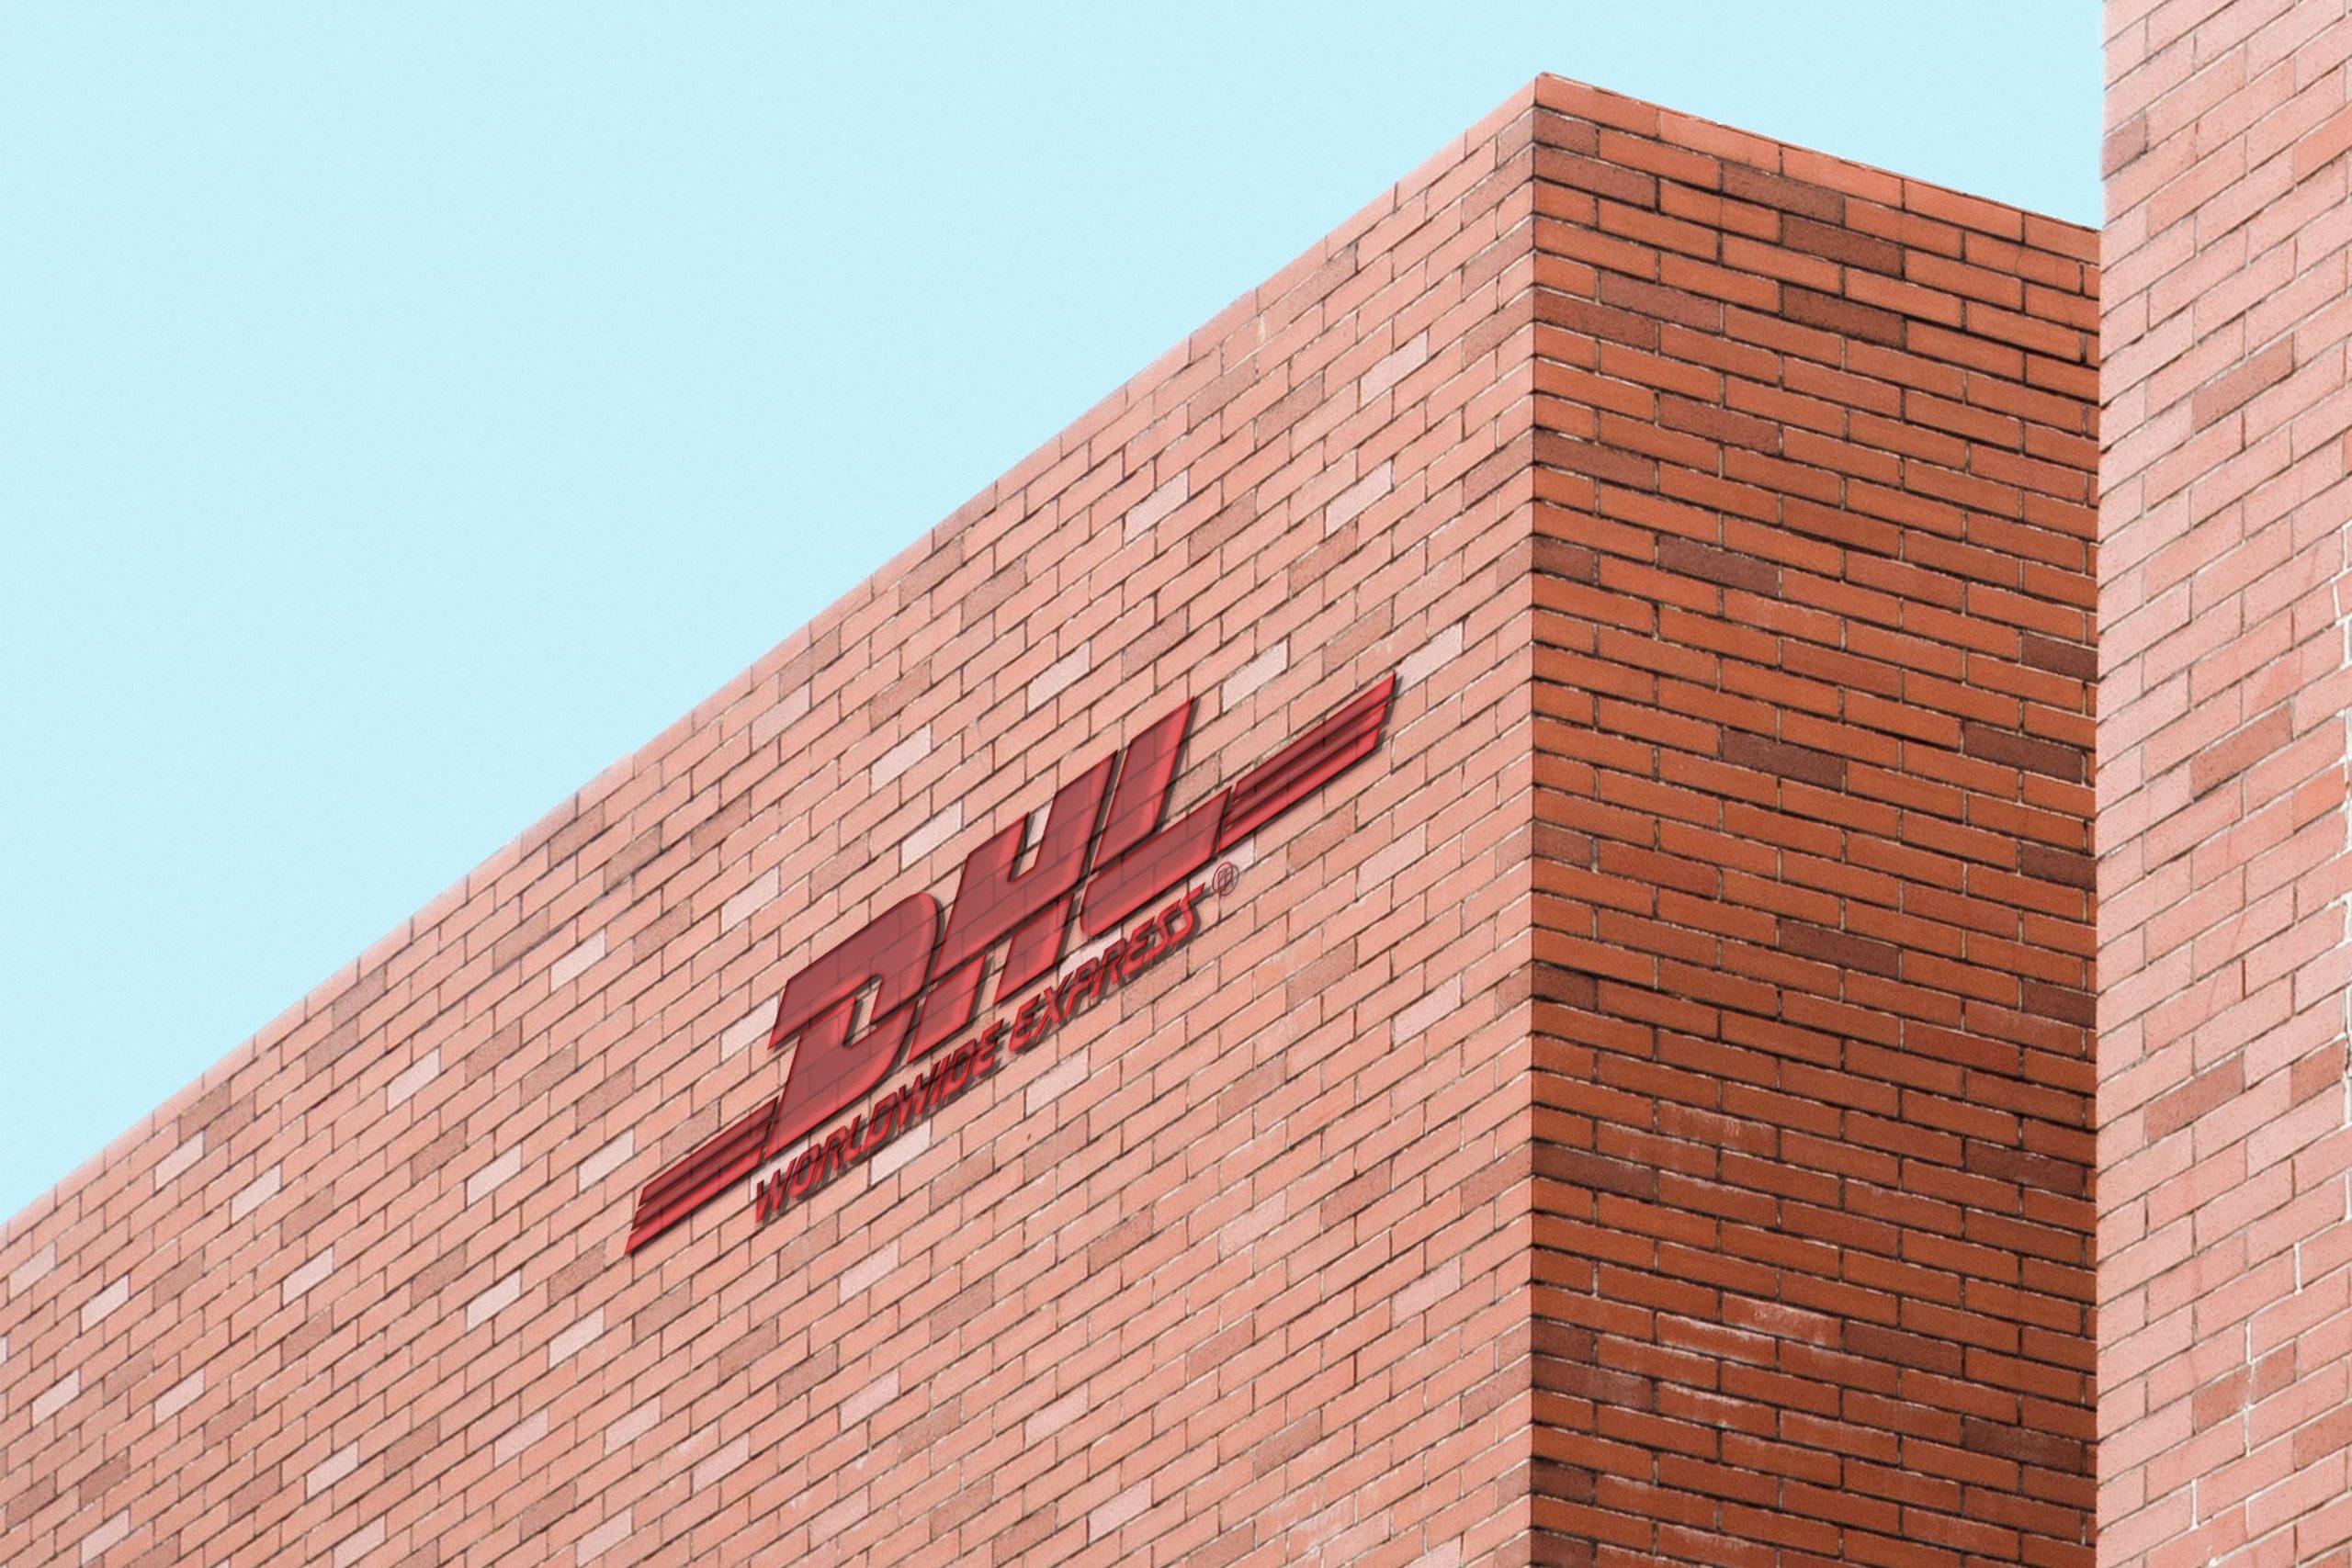 Free Glass Logo Brick Building Mockup